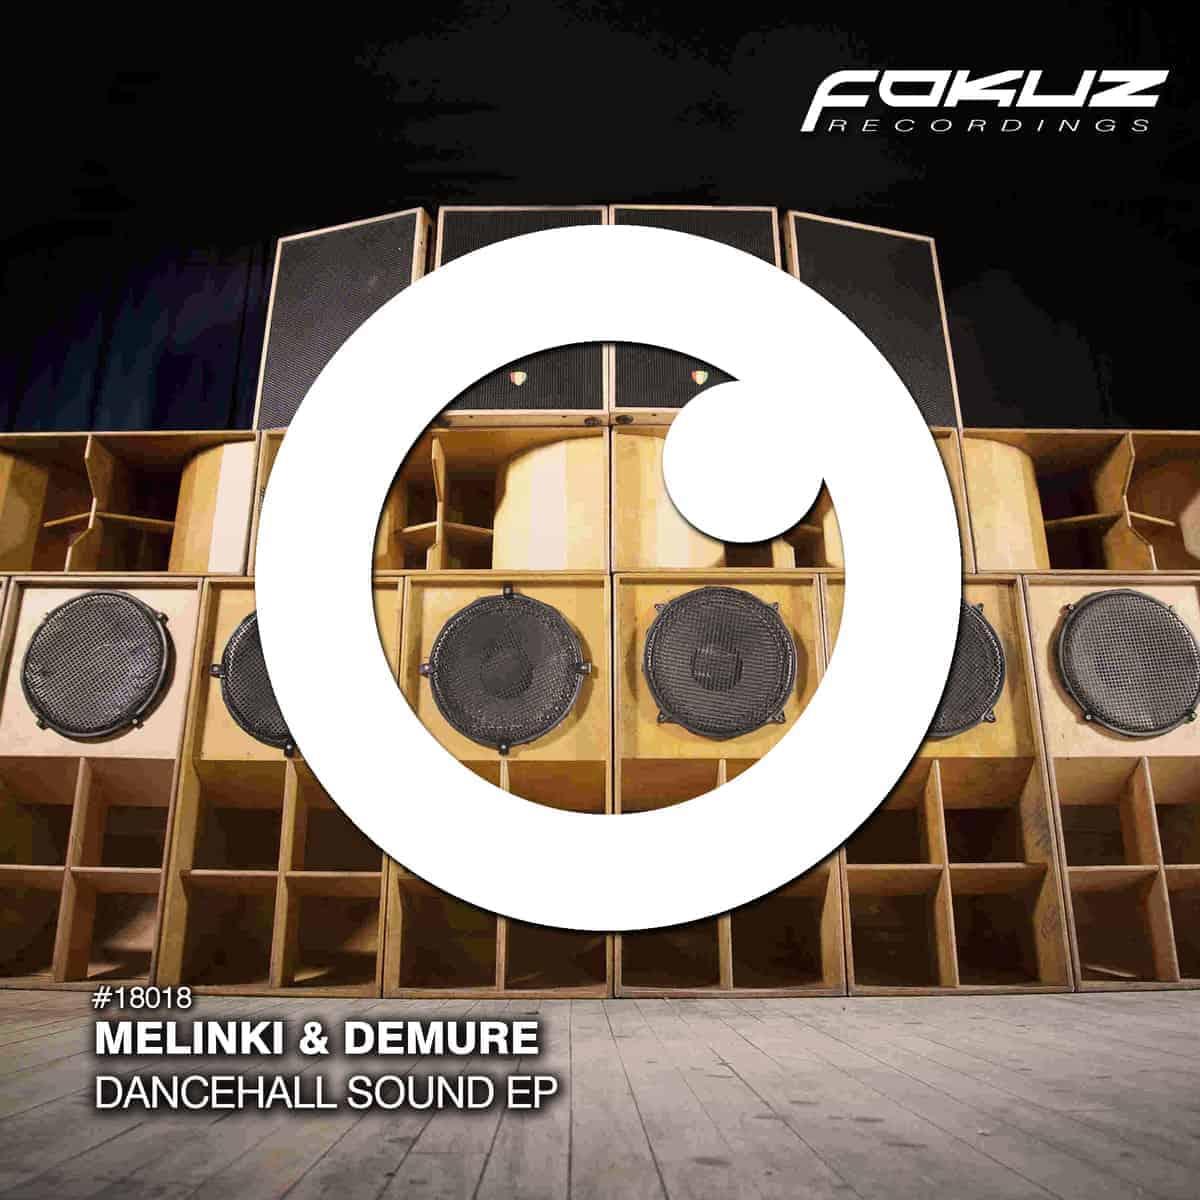 fOKUZ18018-digital-Artwork-Soundsystem2